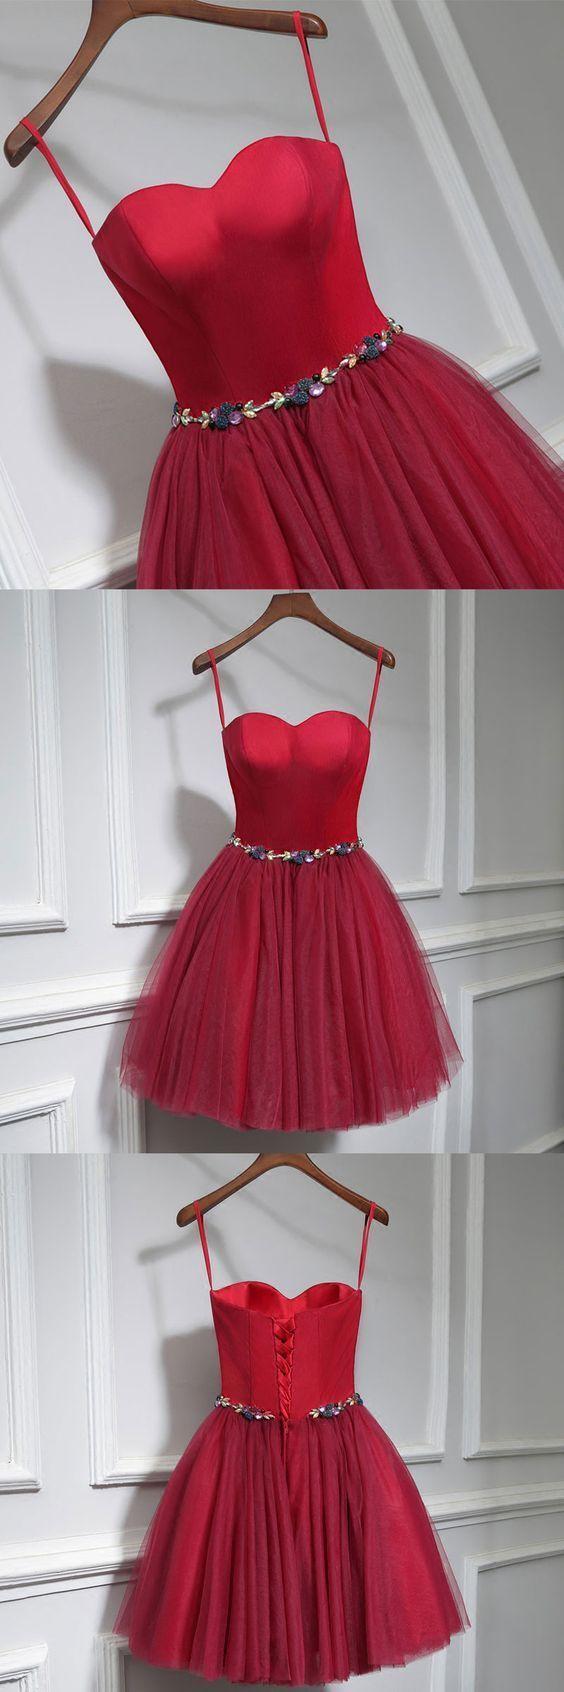 Cute burgundy neck short prom dress homecoming dress beautiful